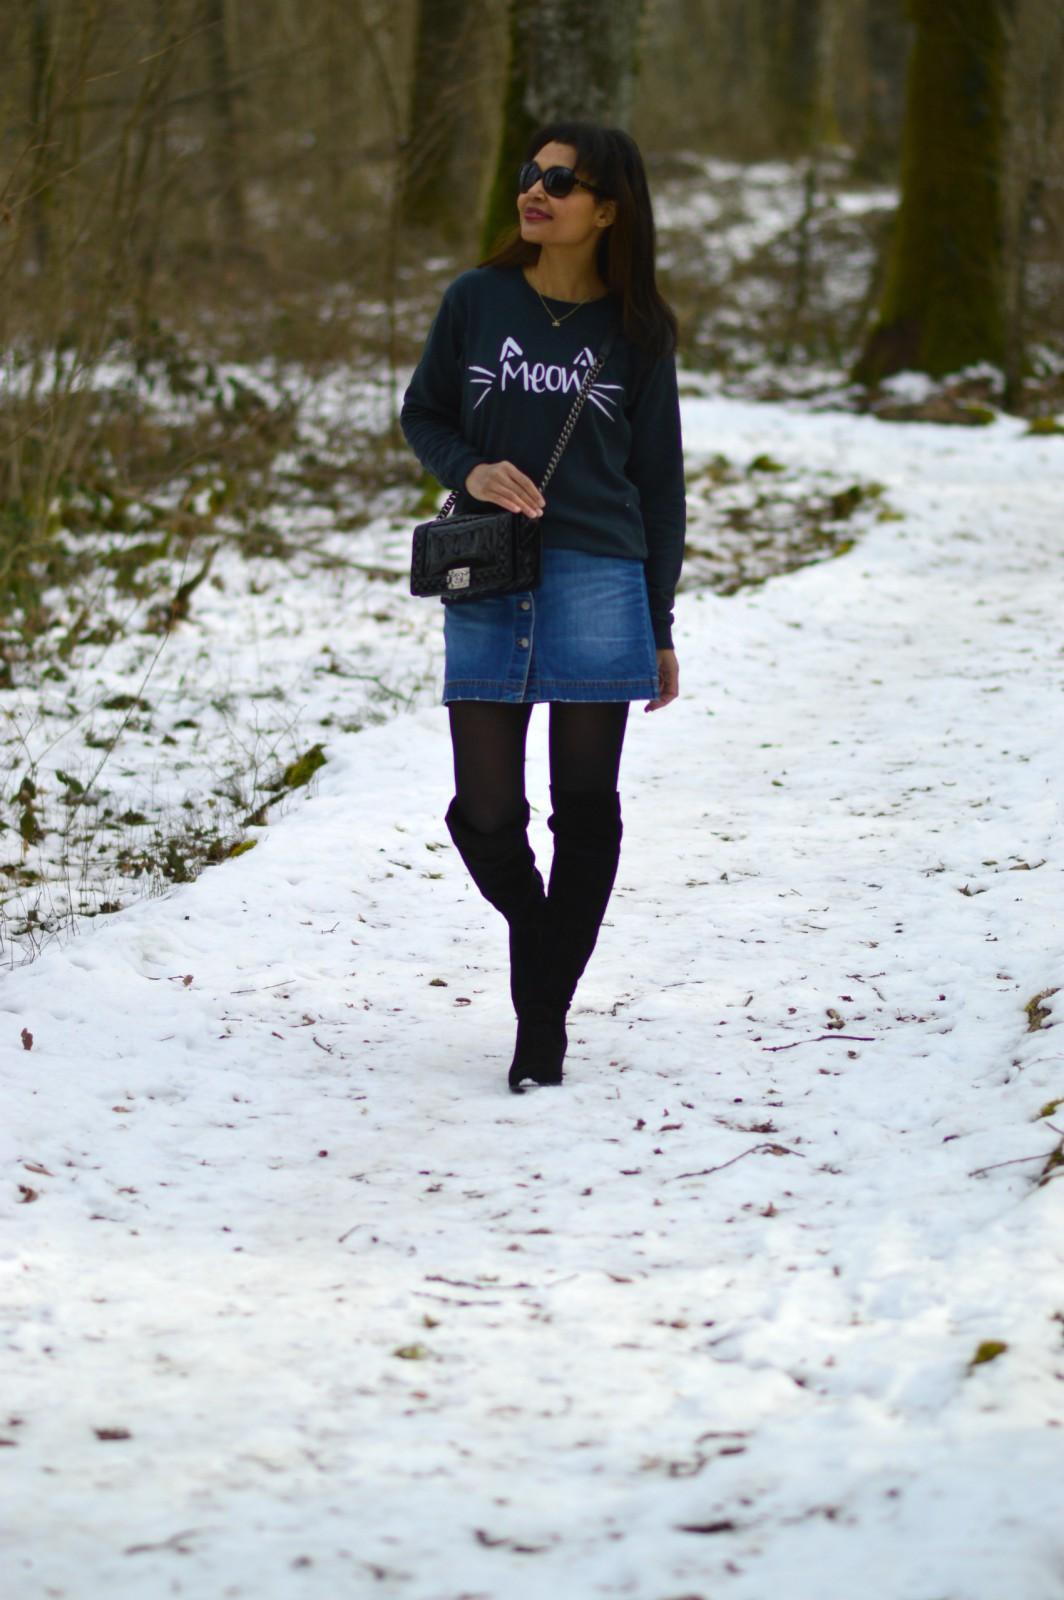 swiss fashion blog/ blog mode